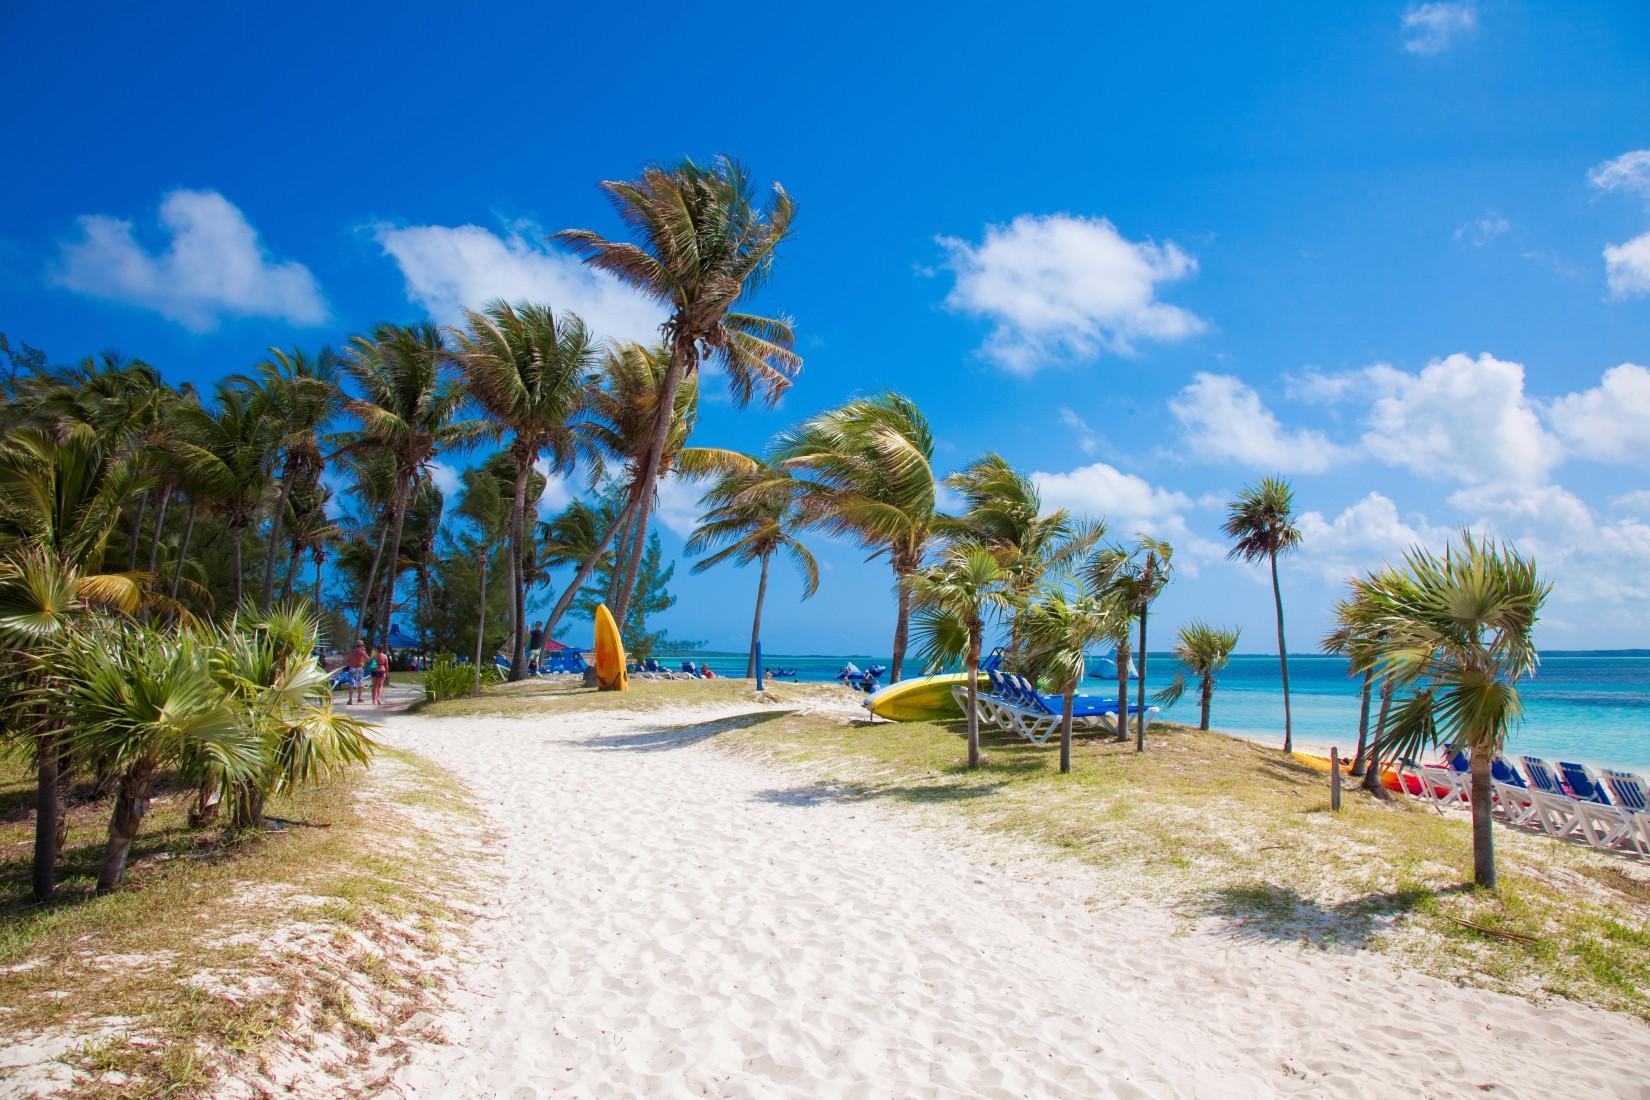 cocoay_royal_caribbean_itinerary